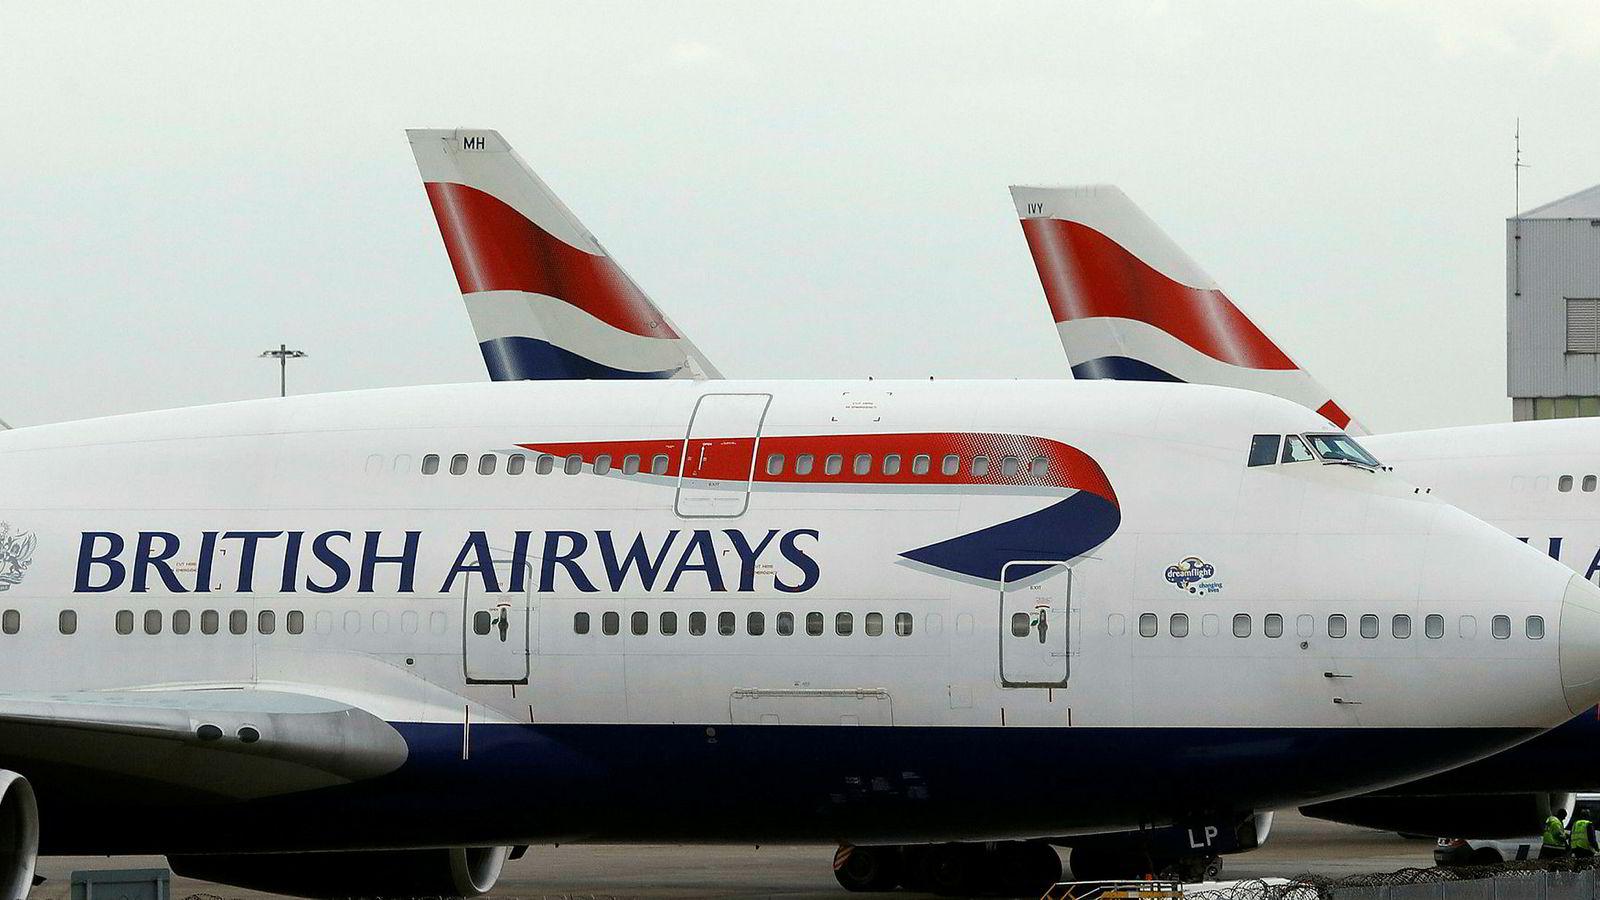 Boeing 747 Jumbojets tilhørende British Airways parkert ved Heathrow Lufthavn, London.